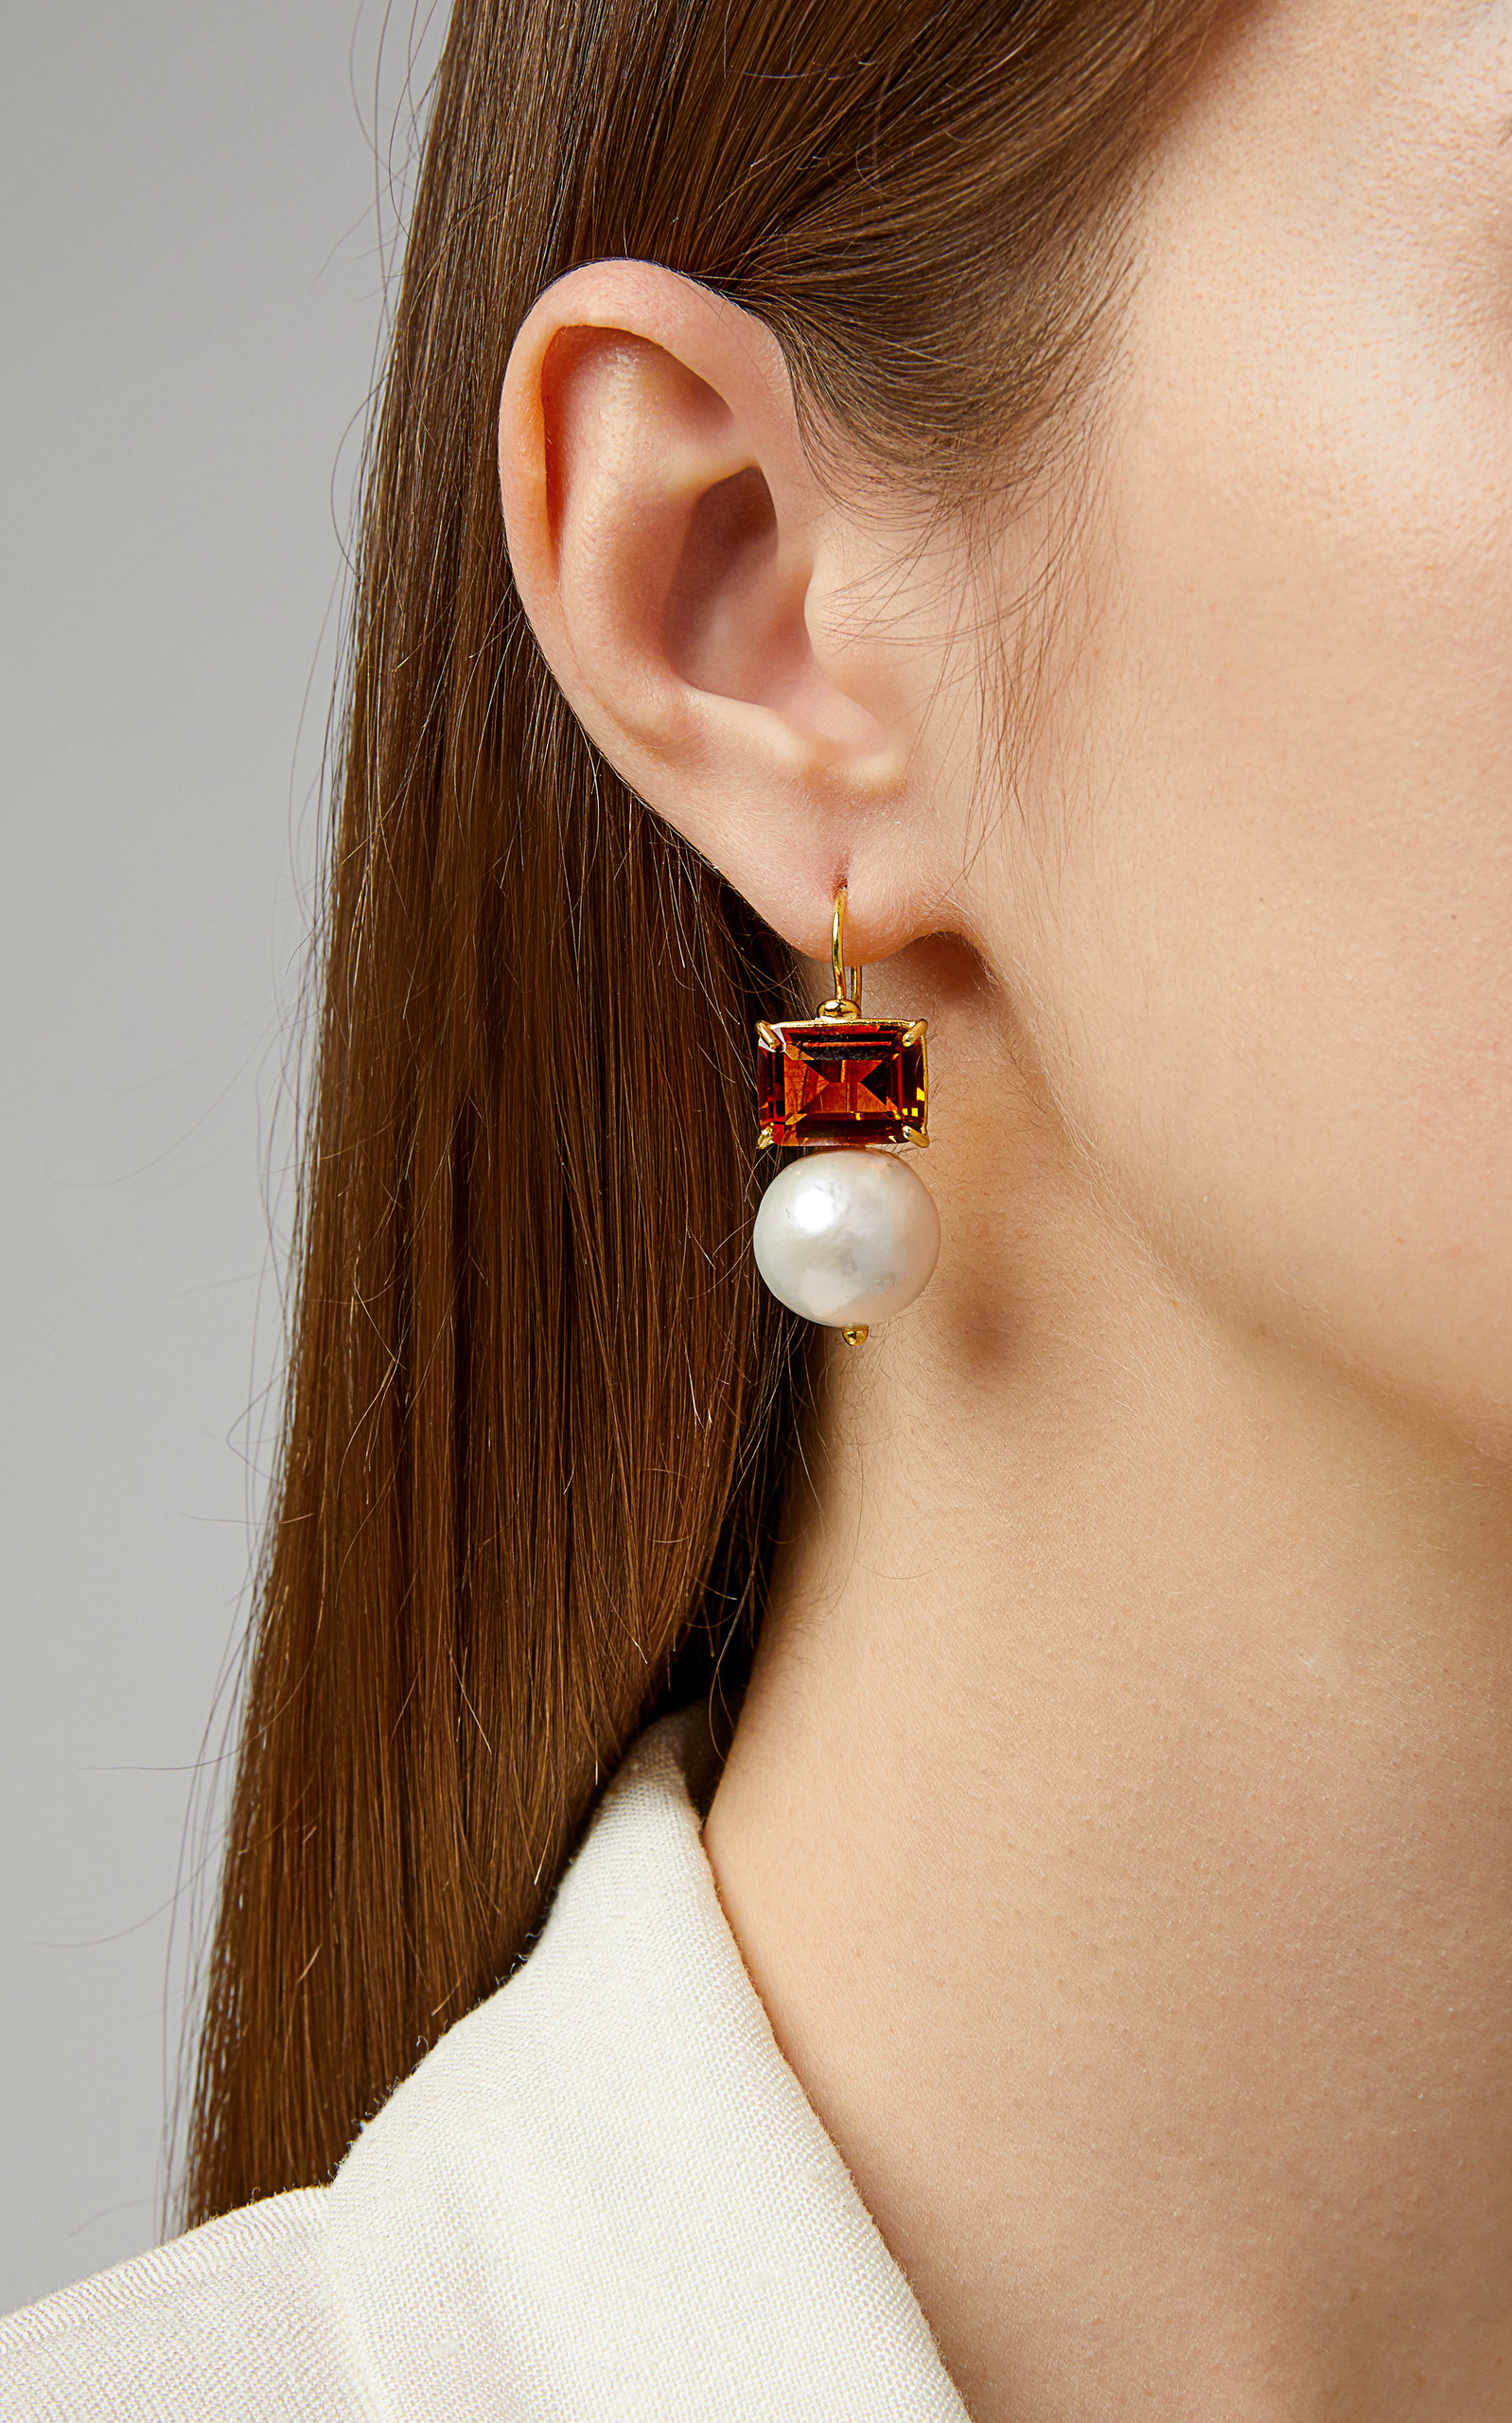 571126ca52f5a Women's Jewelry | Moda Operandi | Moda Operandi